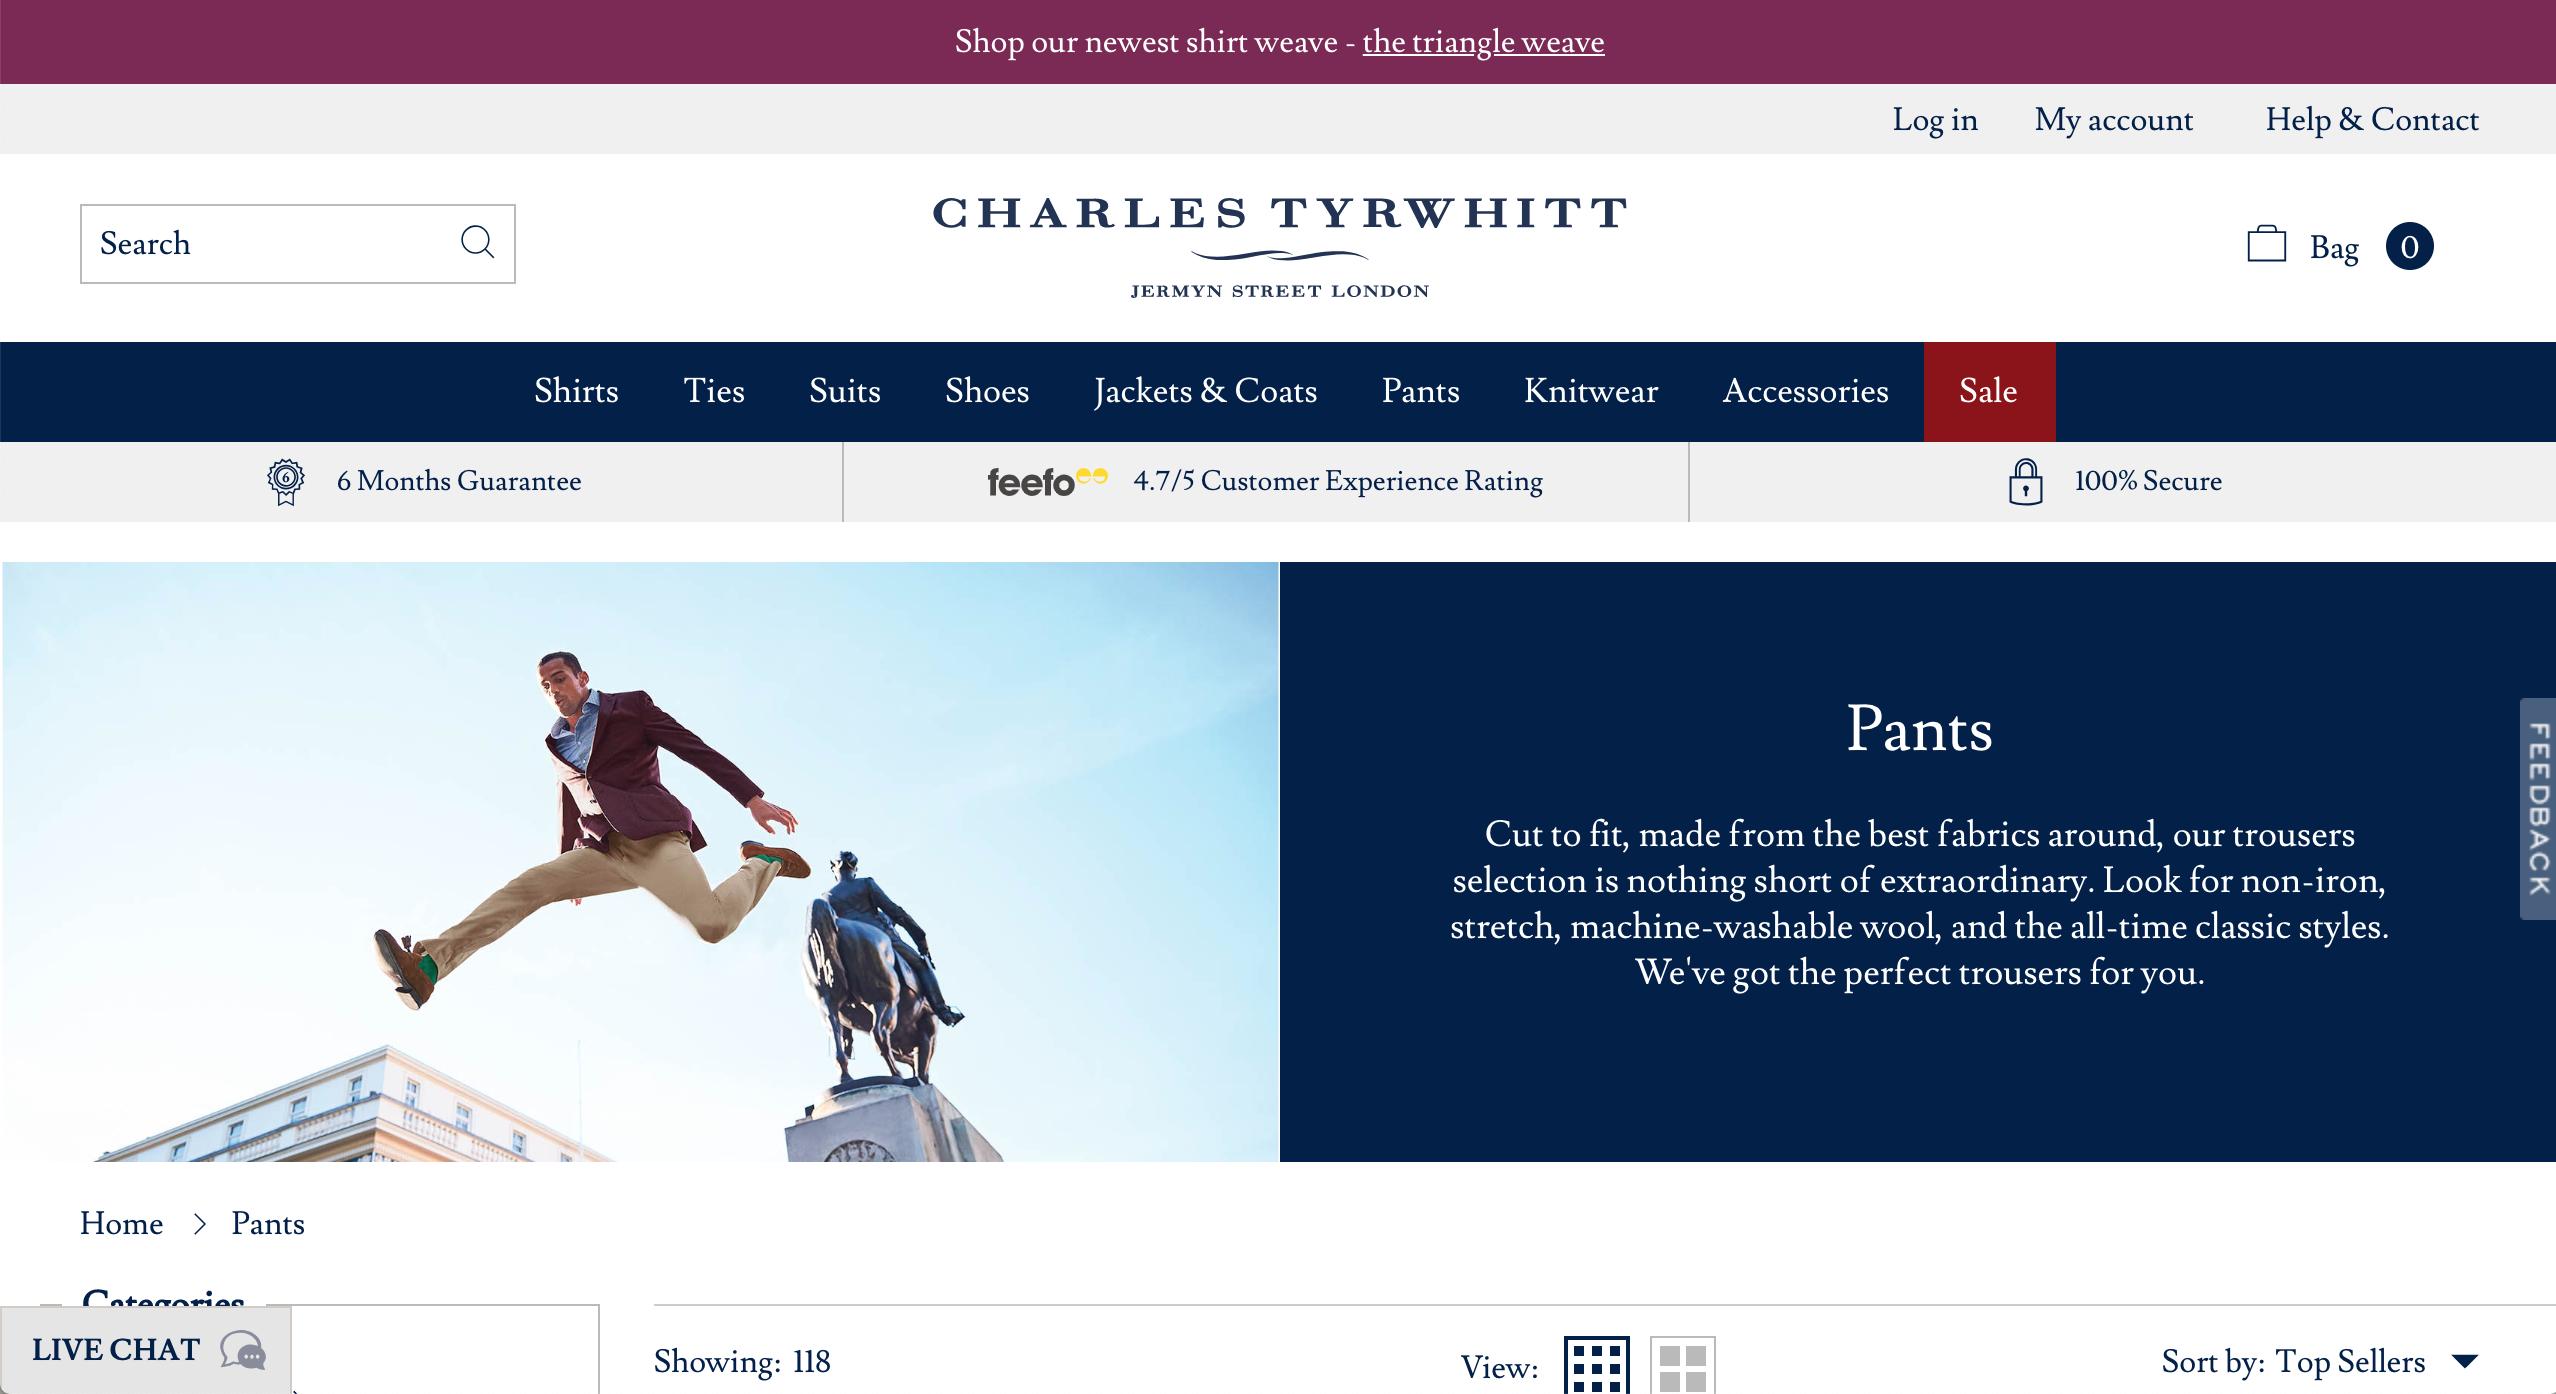 Charles Tyrwhitt pants page